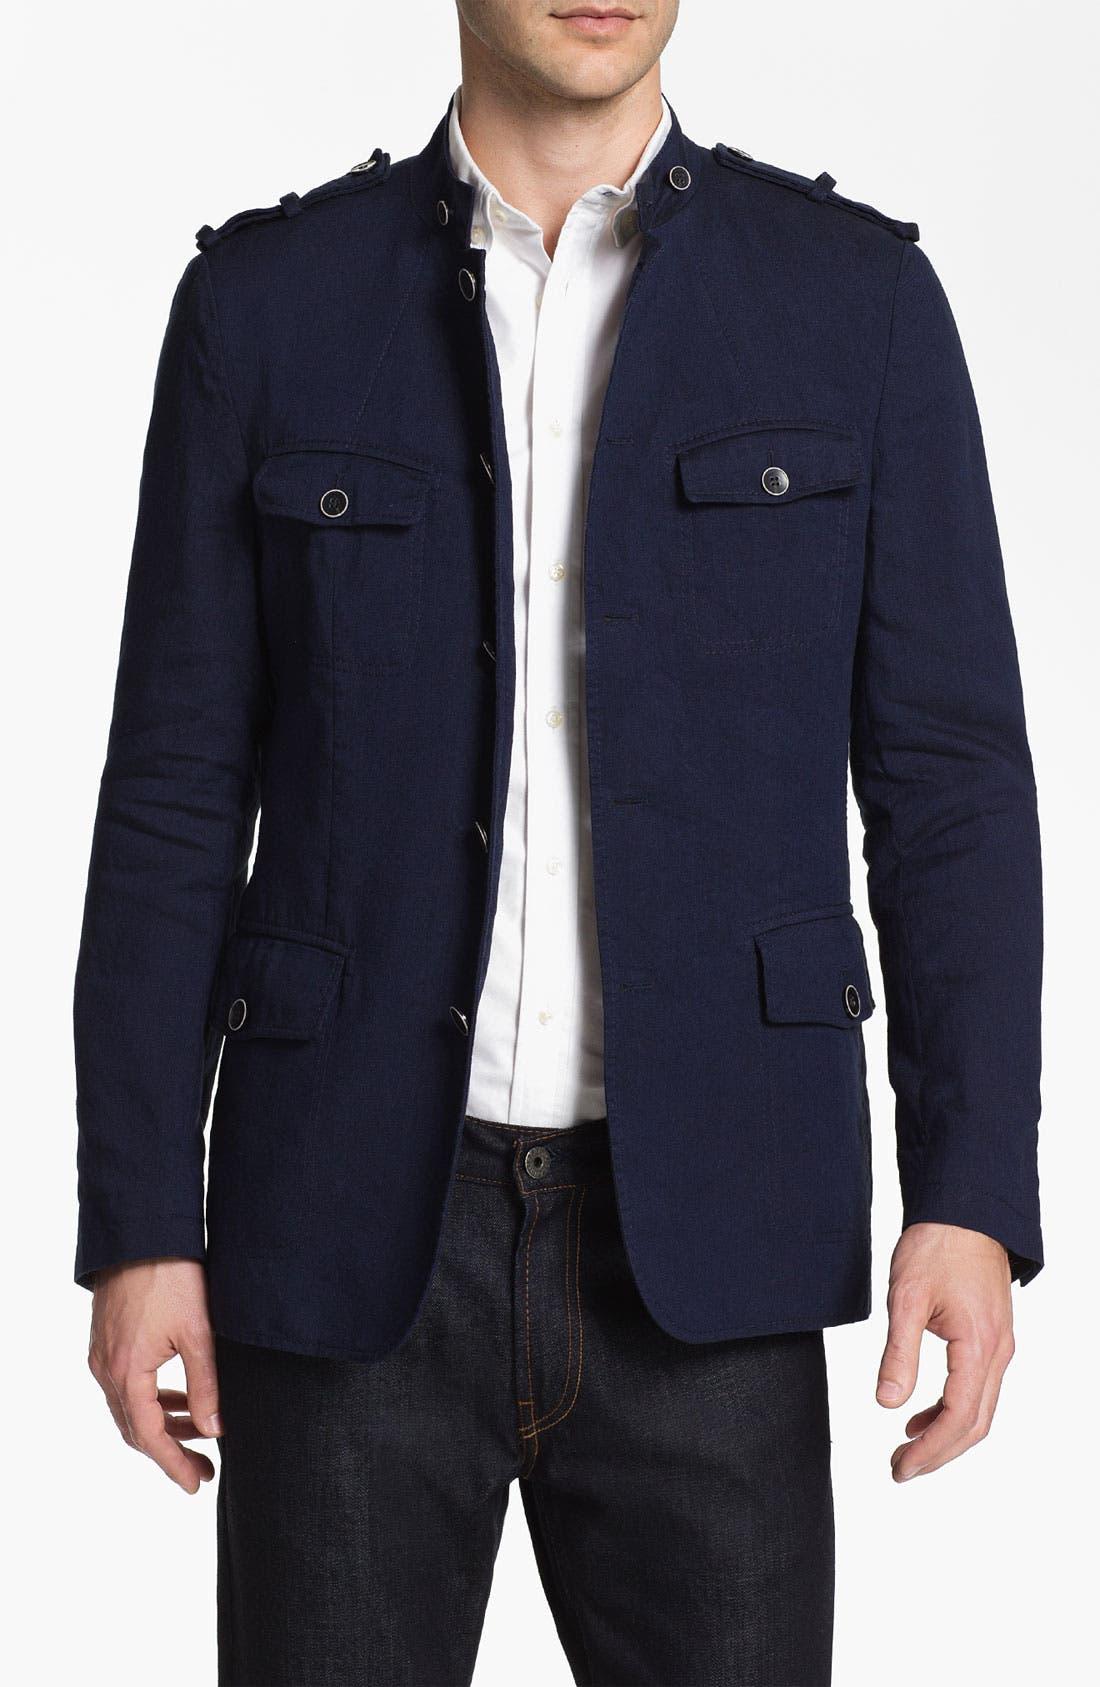 Alternate Image 1 Selected - BOSS Black 'Harlow' Linen Blend Field Jacket (Online Exclusive)